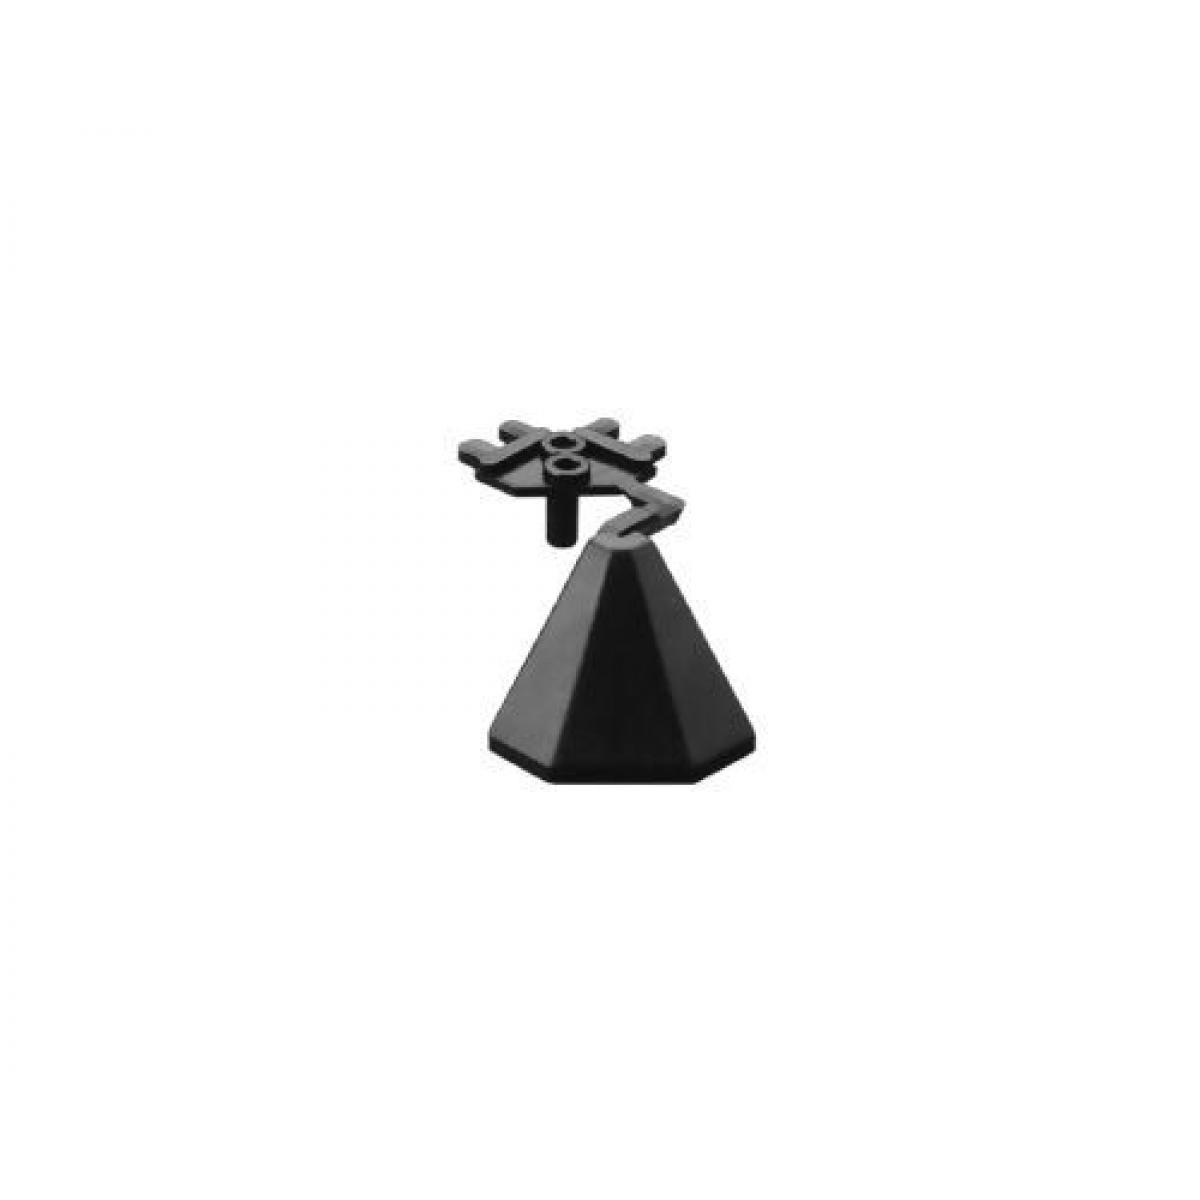 Угол внешний 90 гр к плинтусу столешницы SA14207, цвет серый